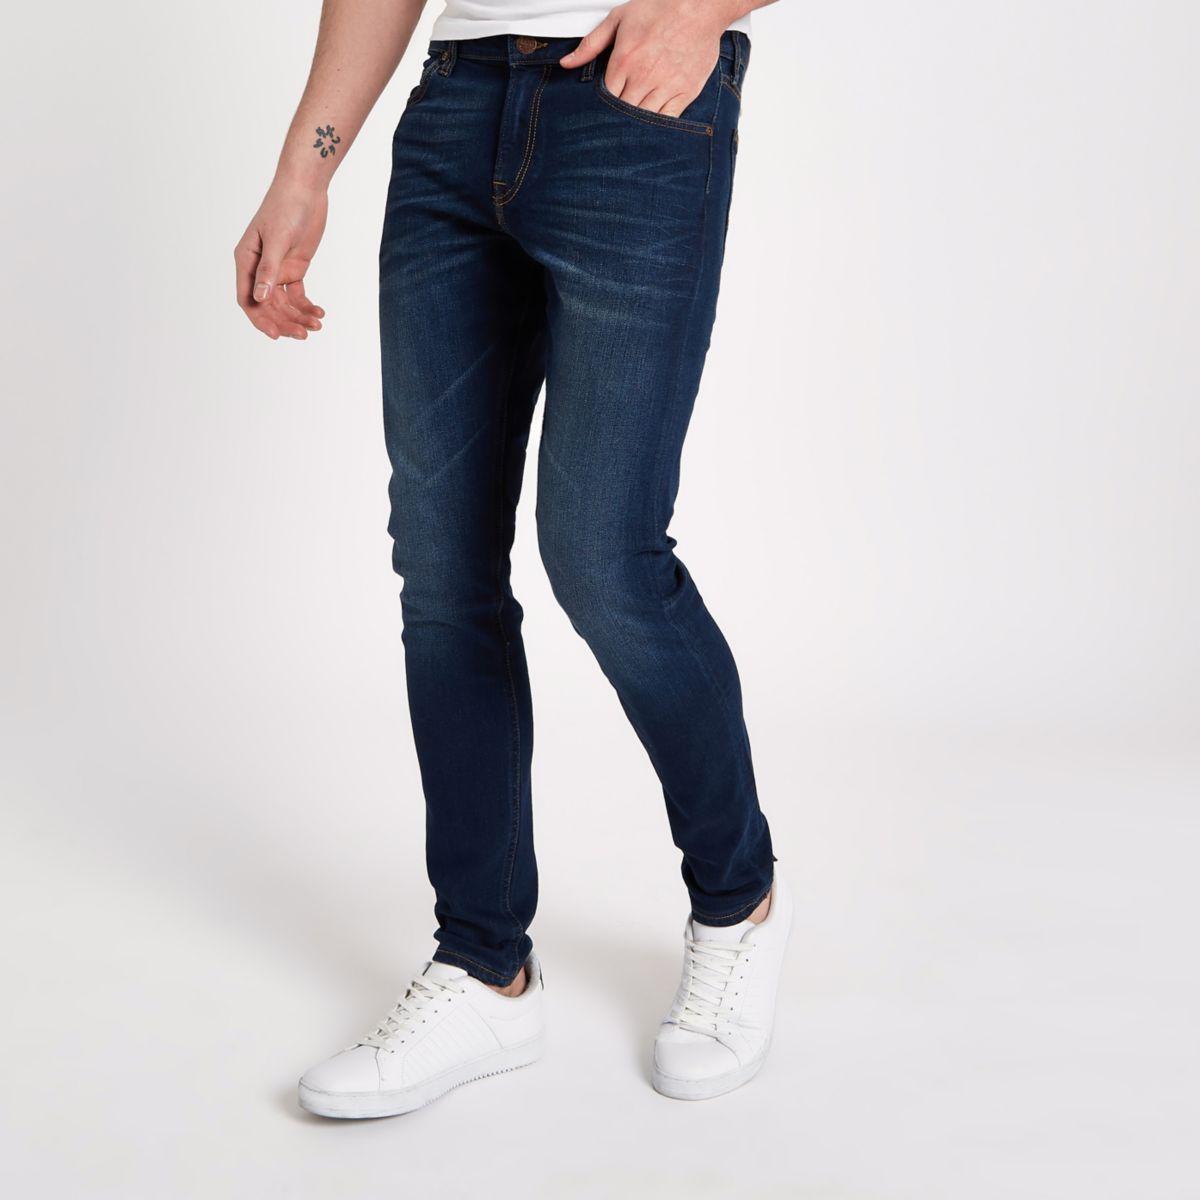 Lee - Malone - Blauwe skinny-fit jeans met stretch